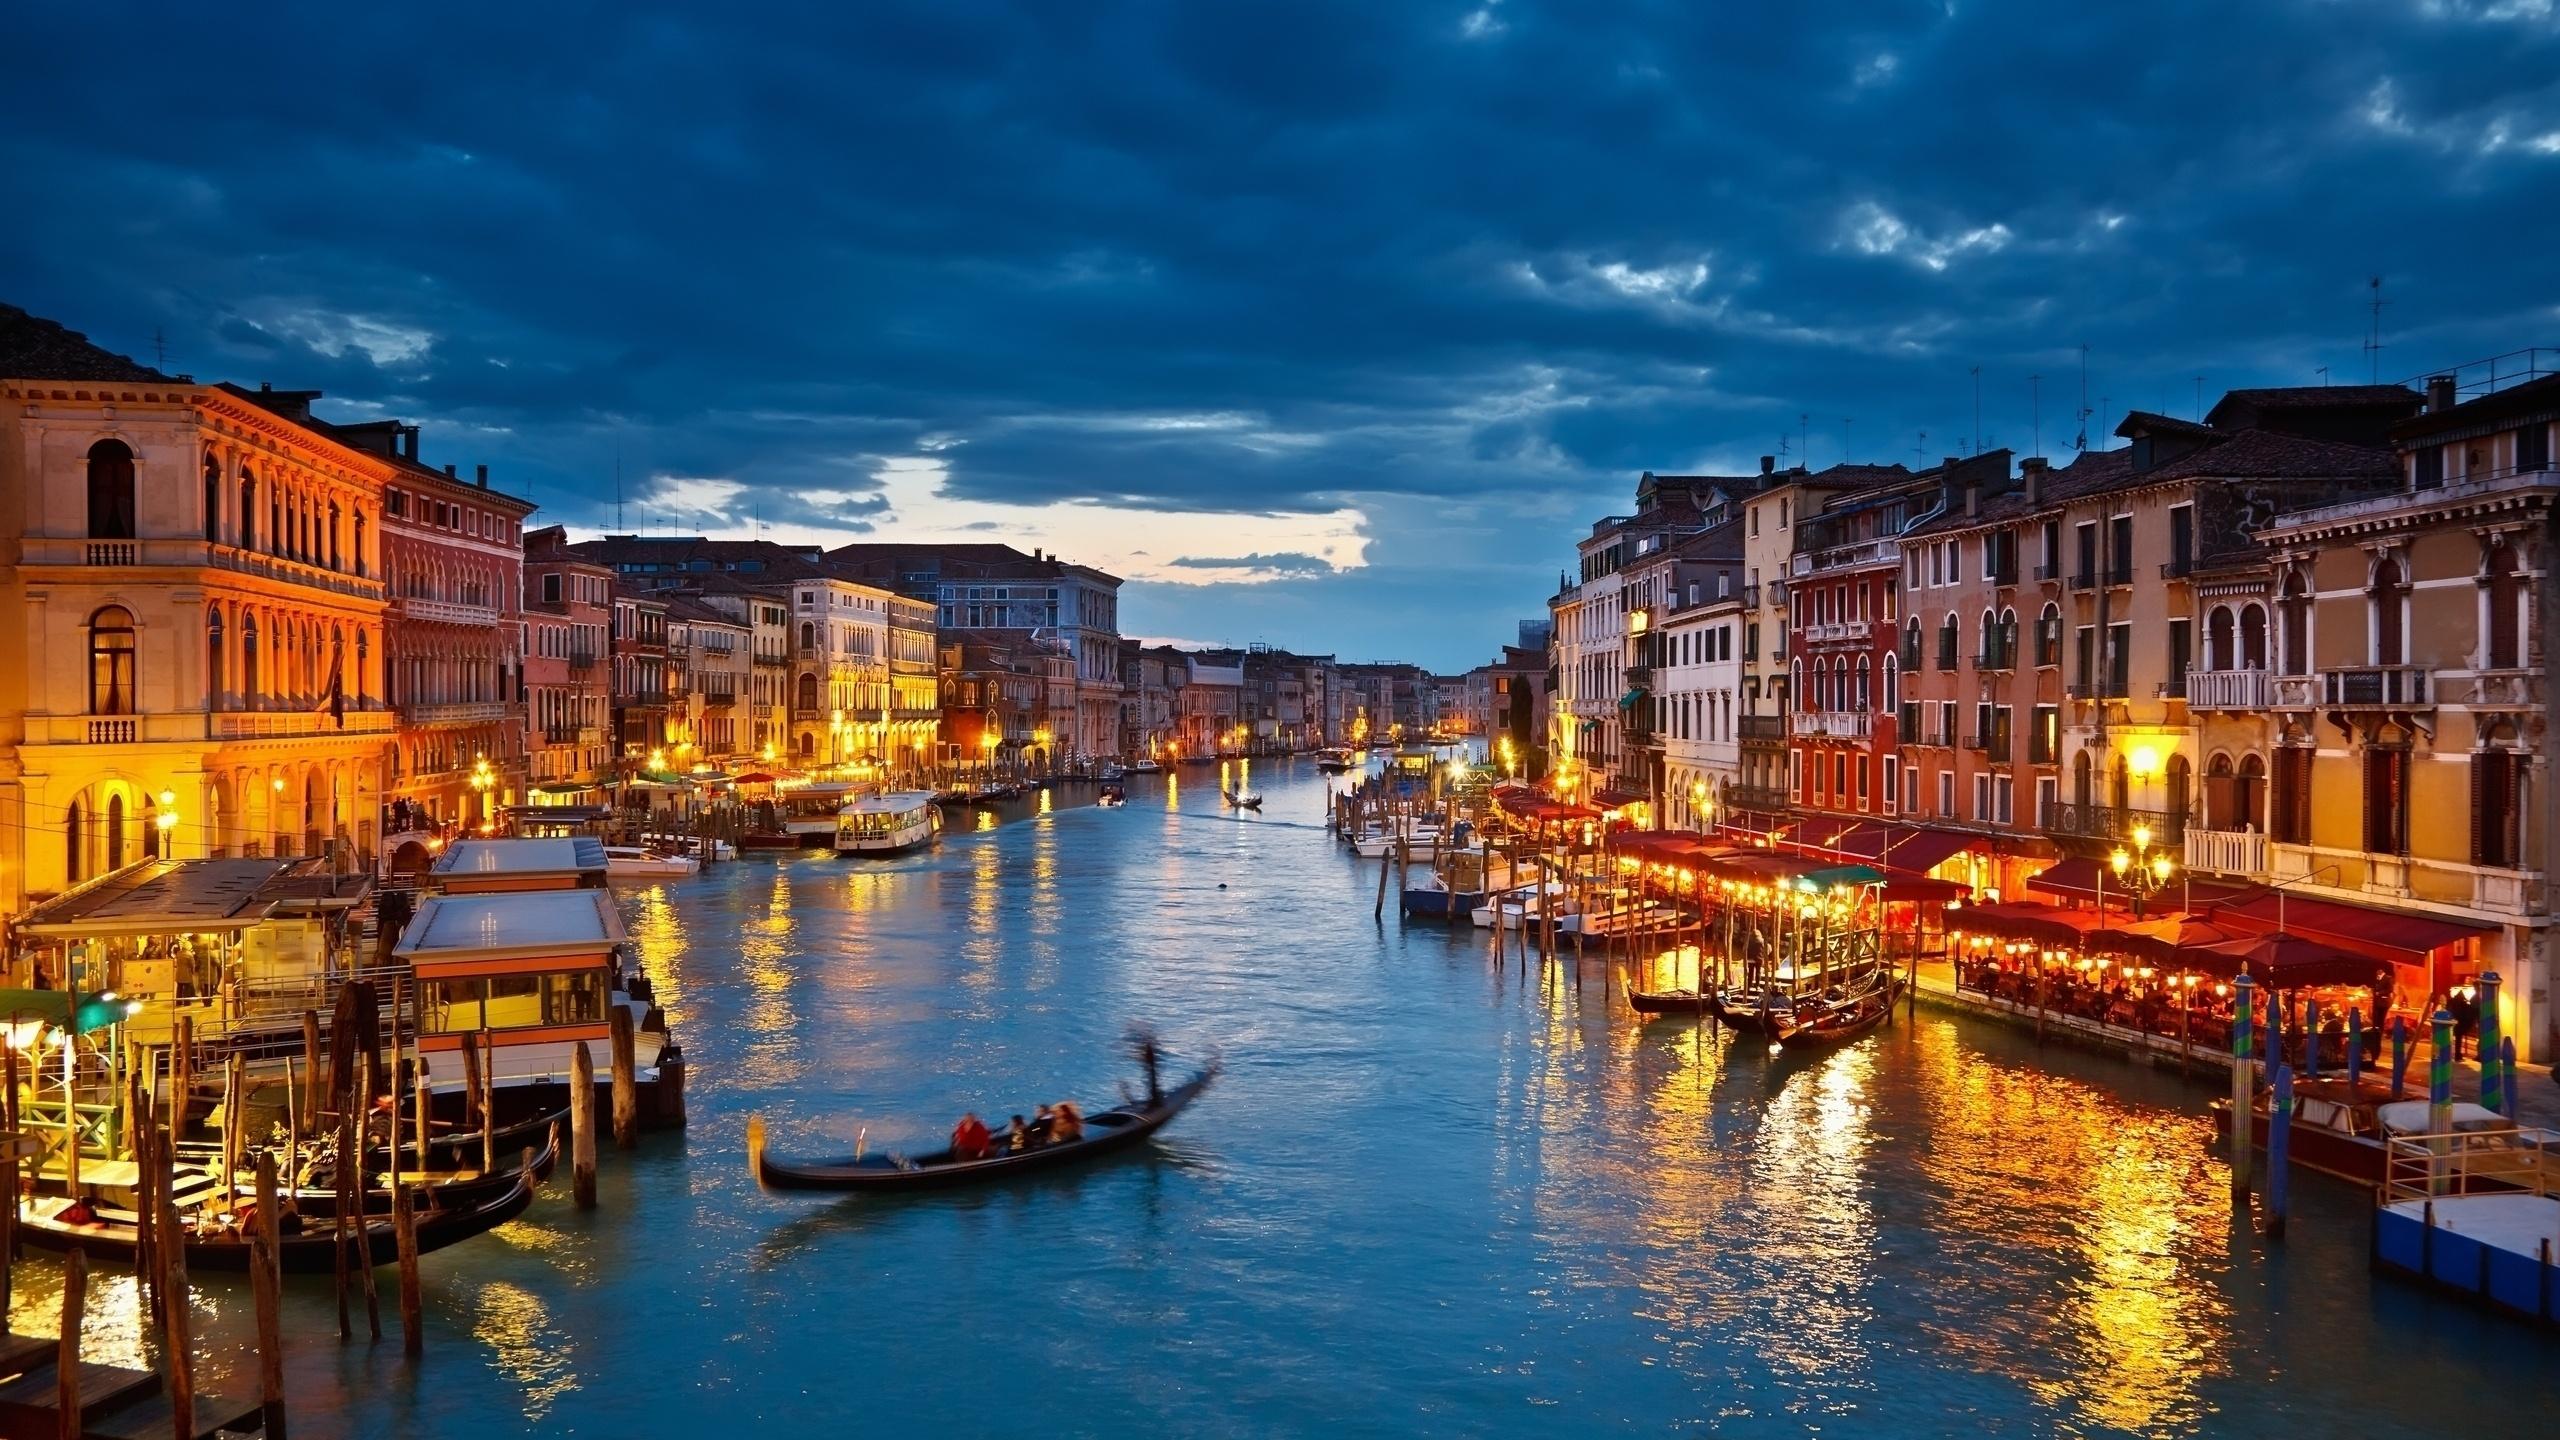 Night in Venice   Desktop Wallpaper 2560x1440